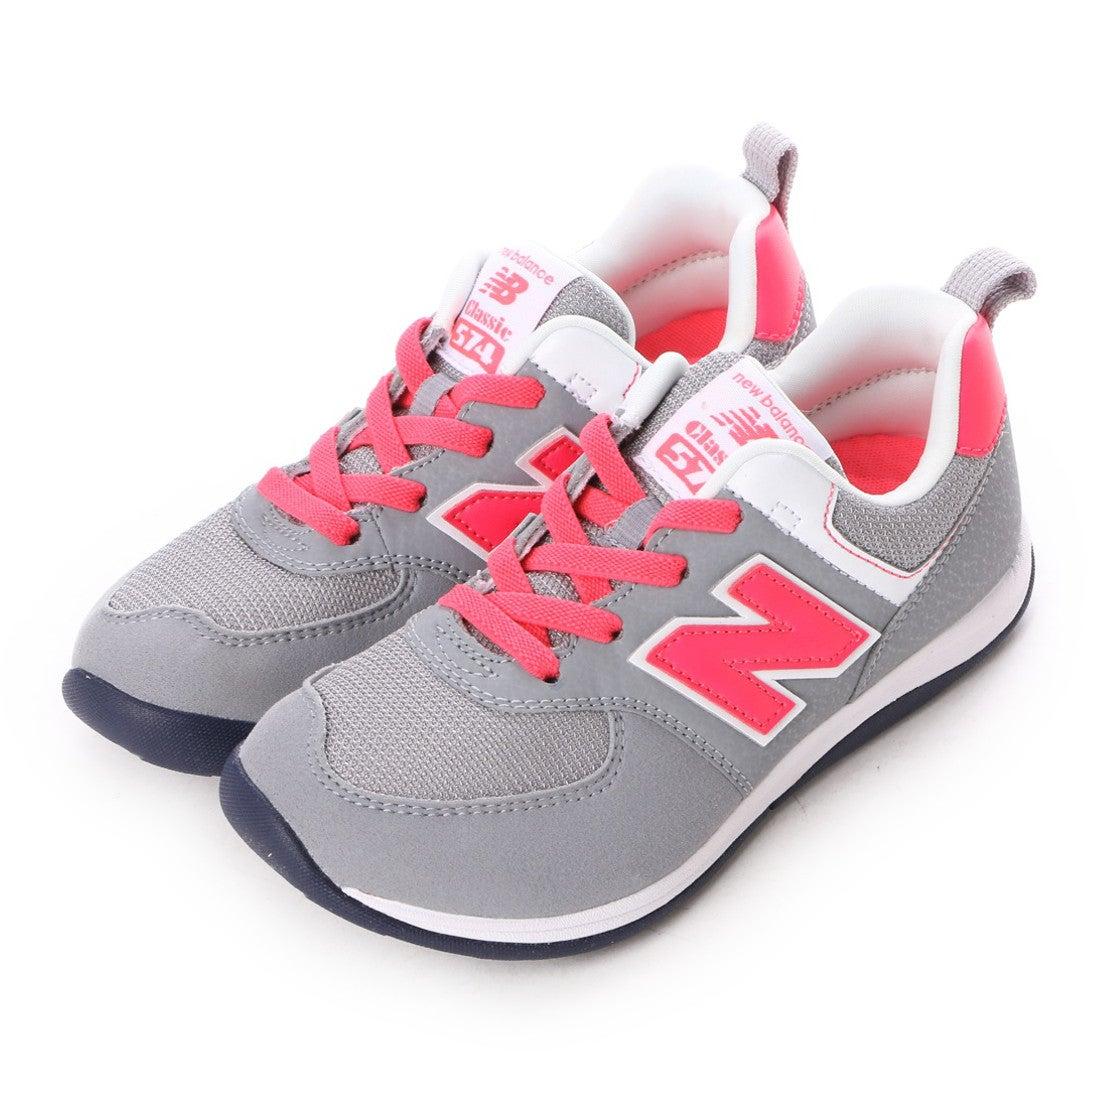 b0dfac8699680 ニューバランス new balance NB KS574 BGP (グレー/ピンク) -靴&ファッション通販 ロコンド〜自宅で試着、気軽に返品